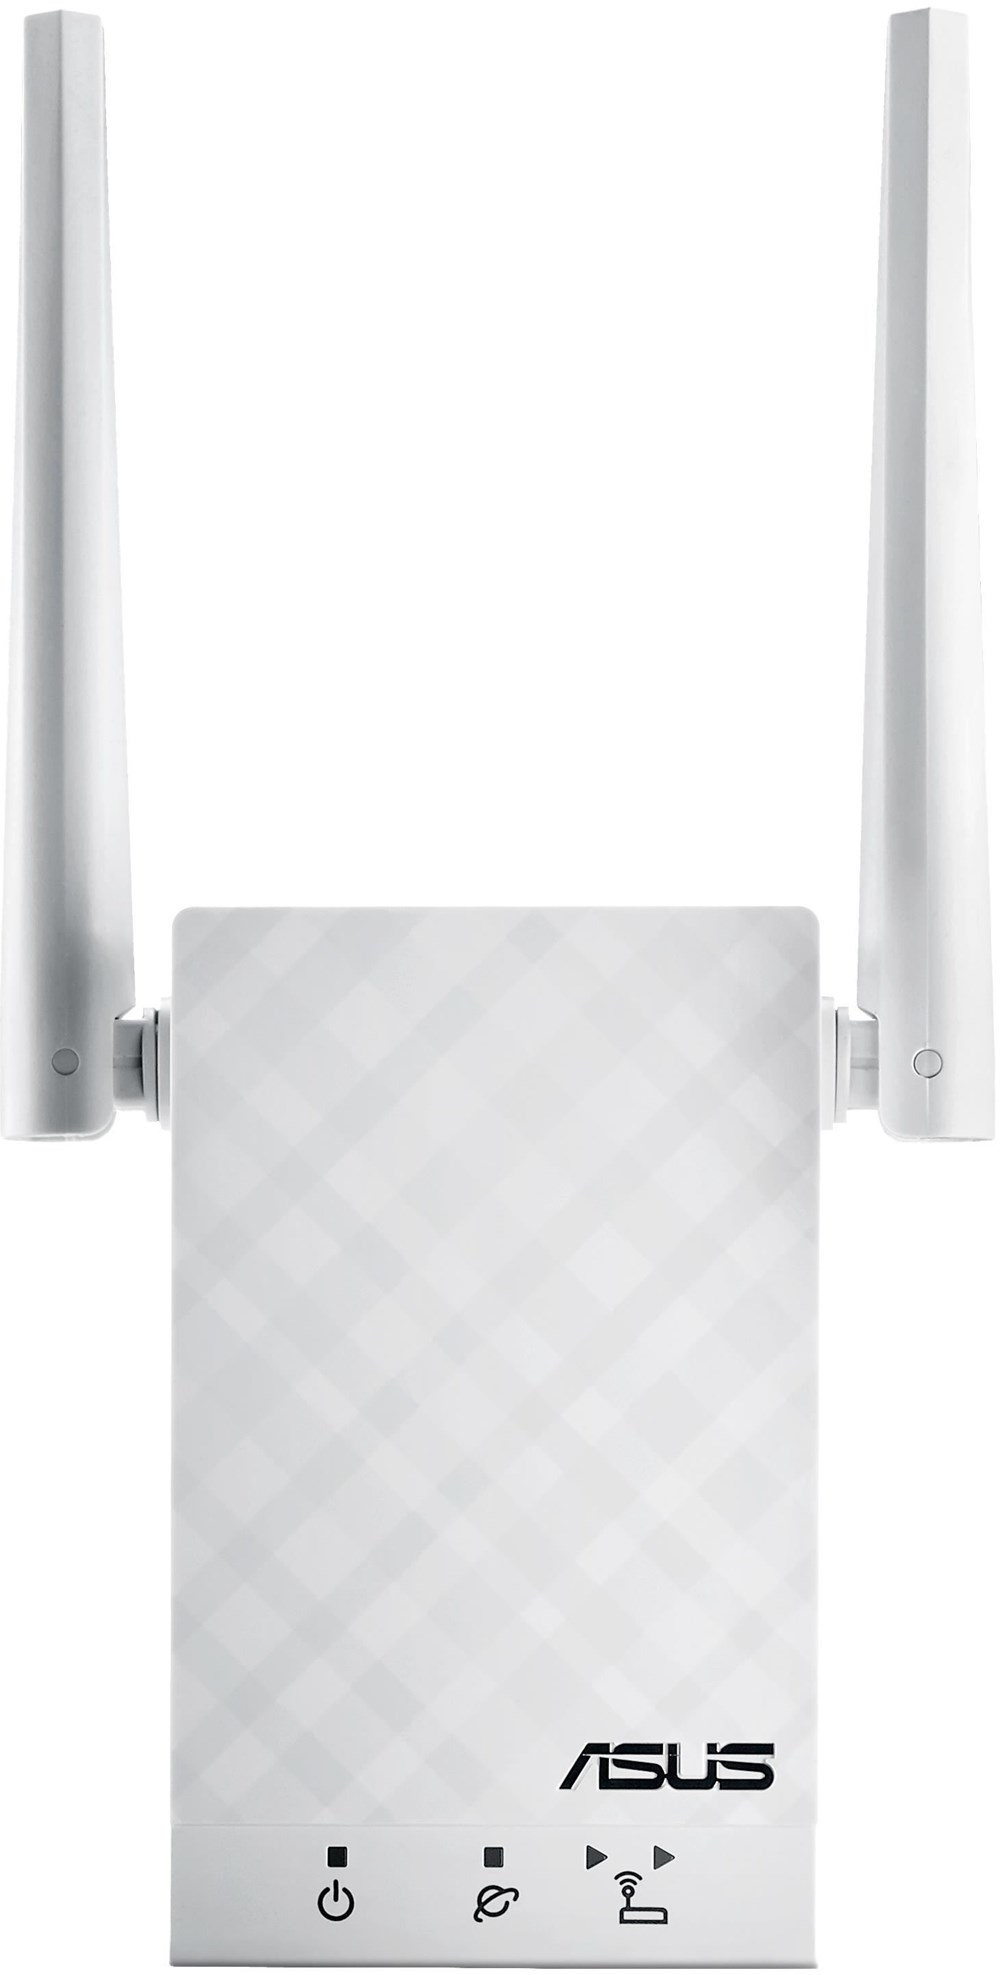 Asus - Rp-ac55 range extender